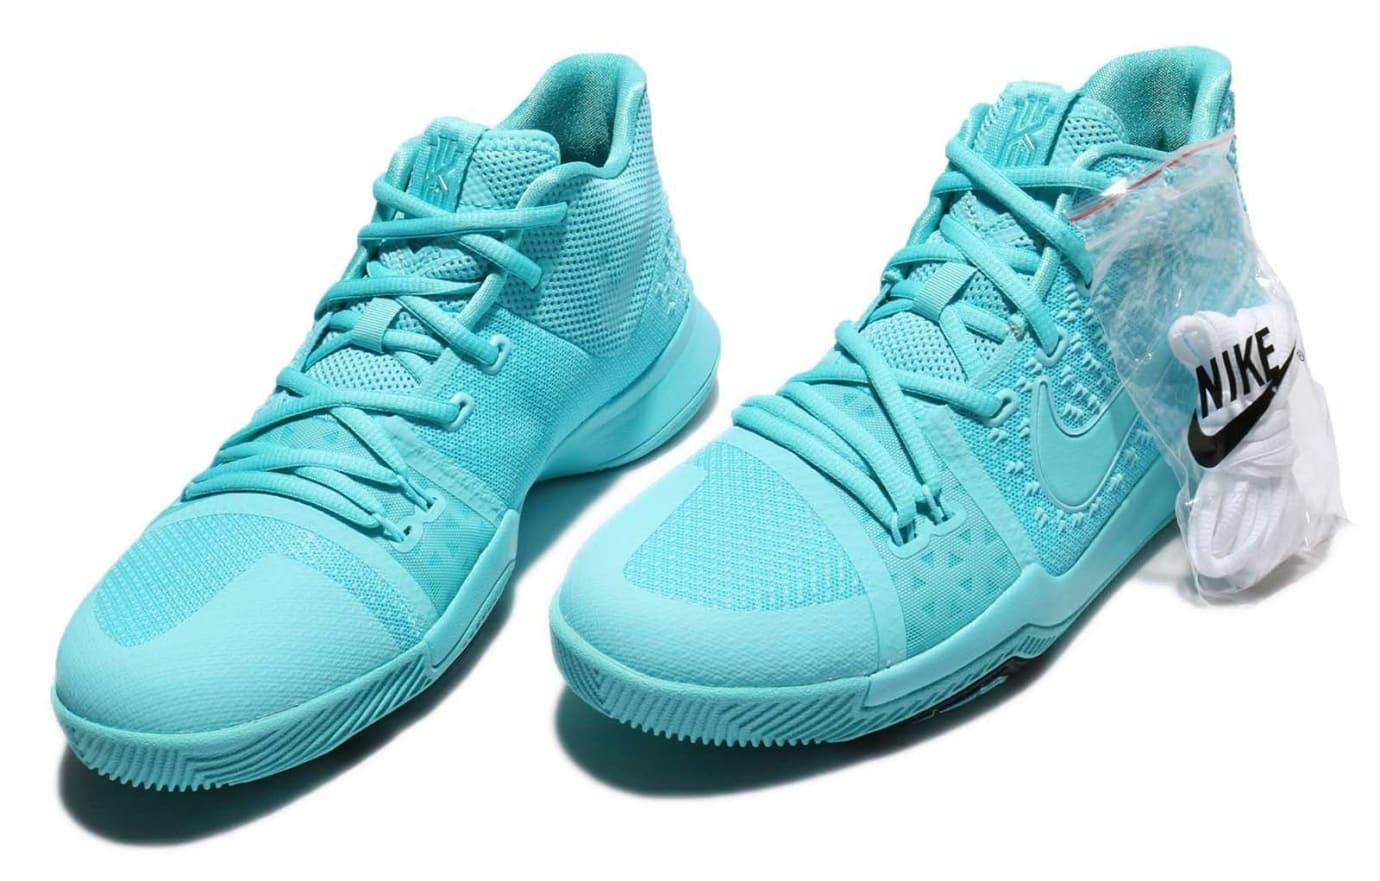 Nike Kyrie 3 GS Aqua Release Date Pair 859466-401